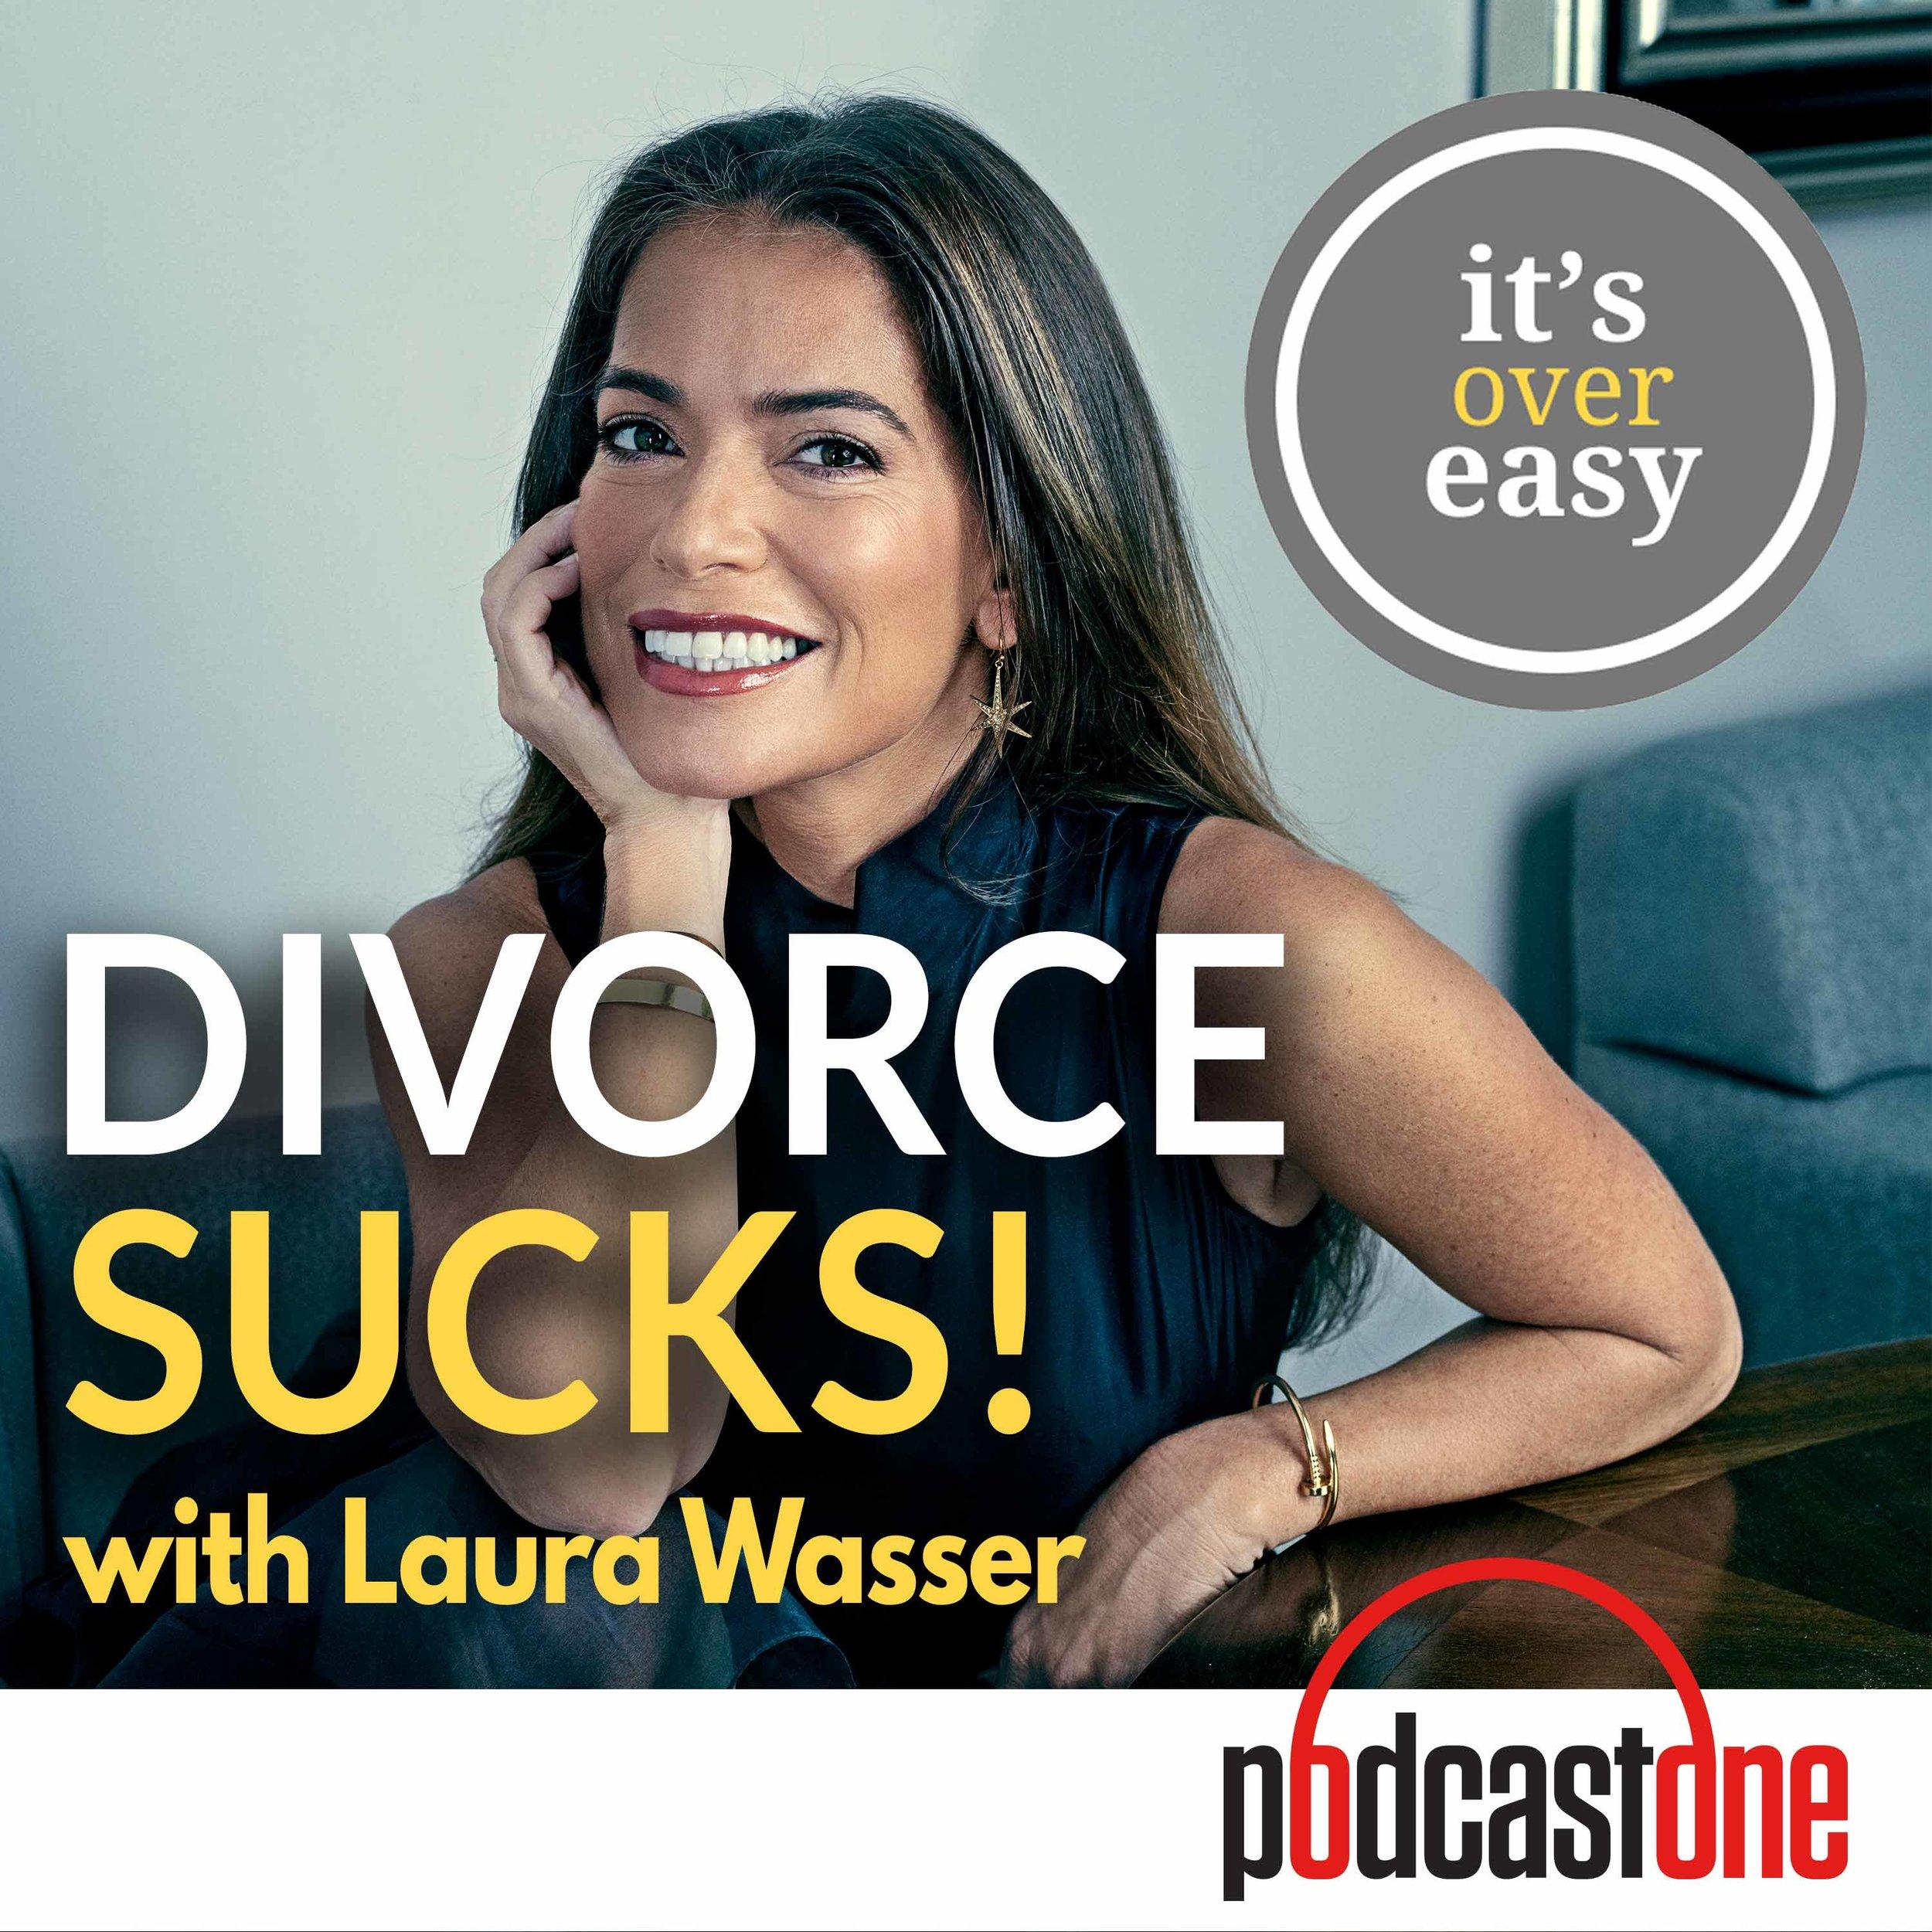 divorcesucks_logo.jpg